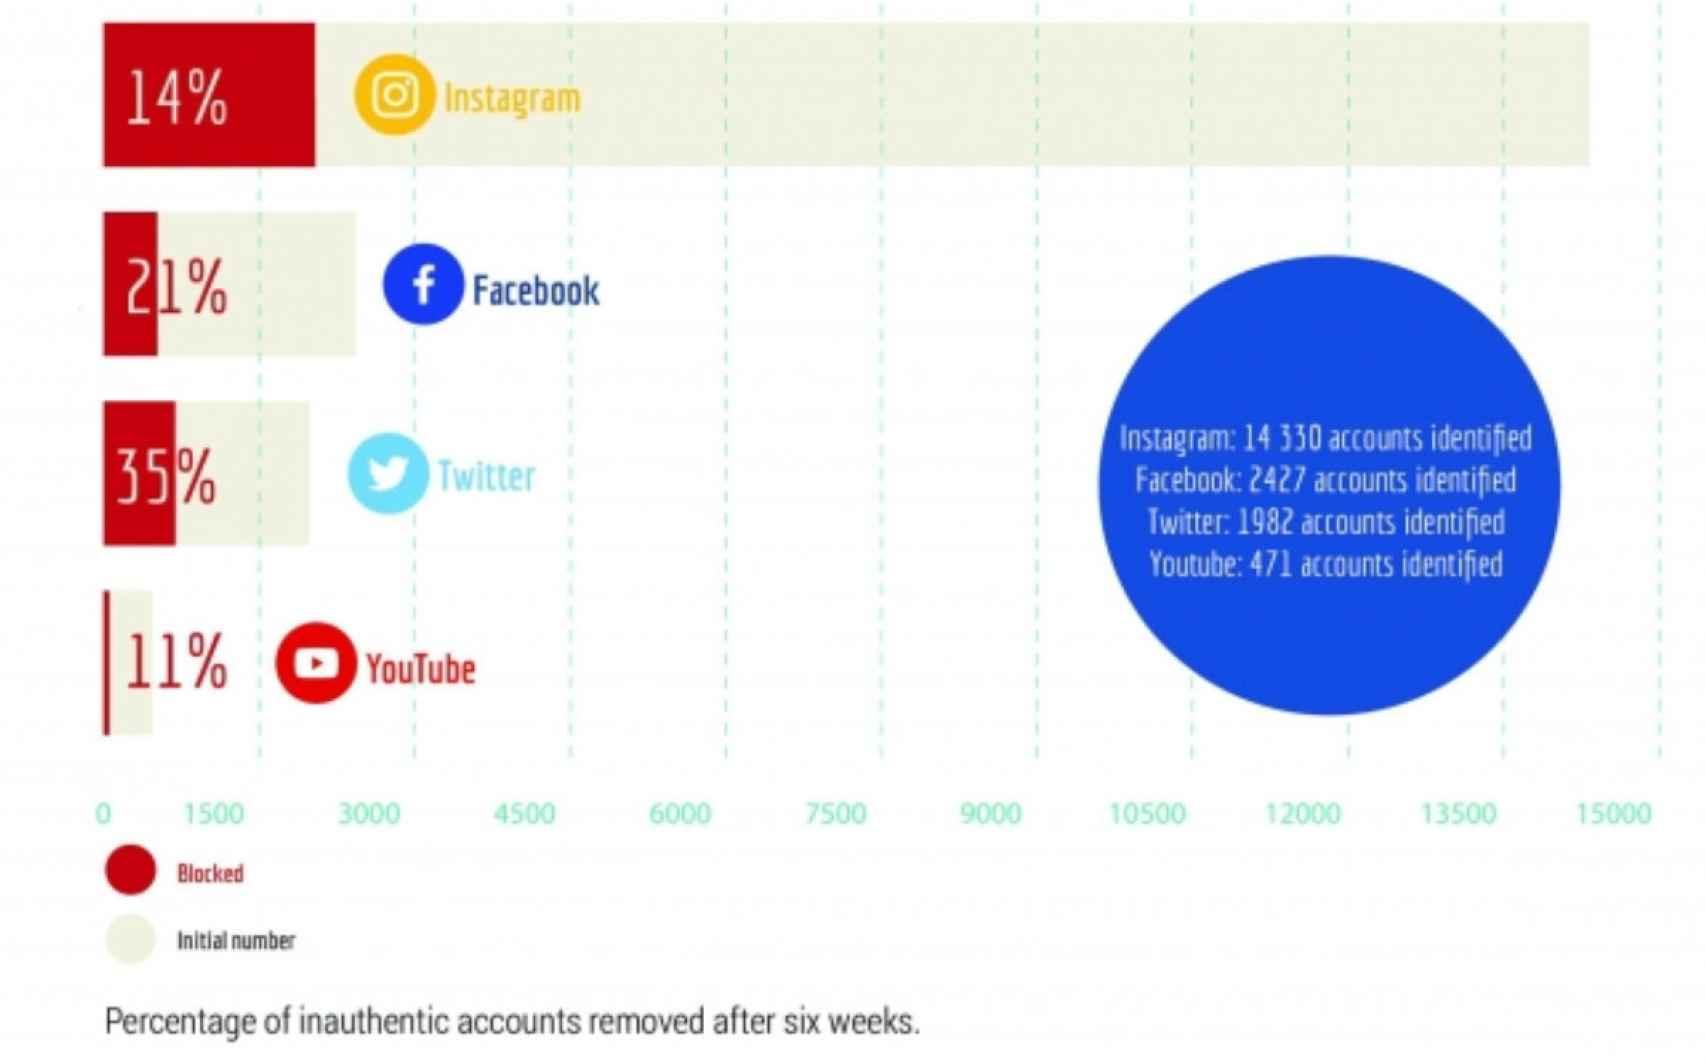 Porcentaje de cuentas falsas eliminadas después de seis semanas